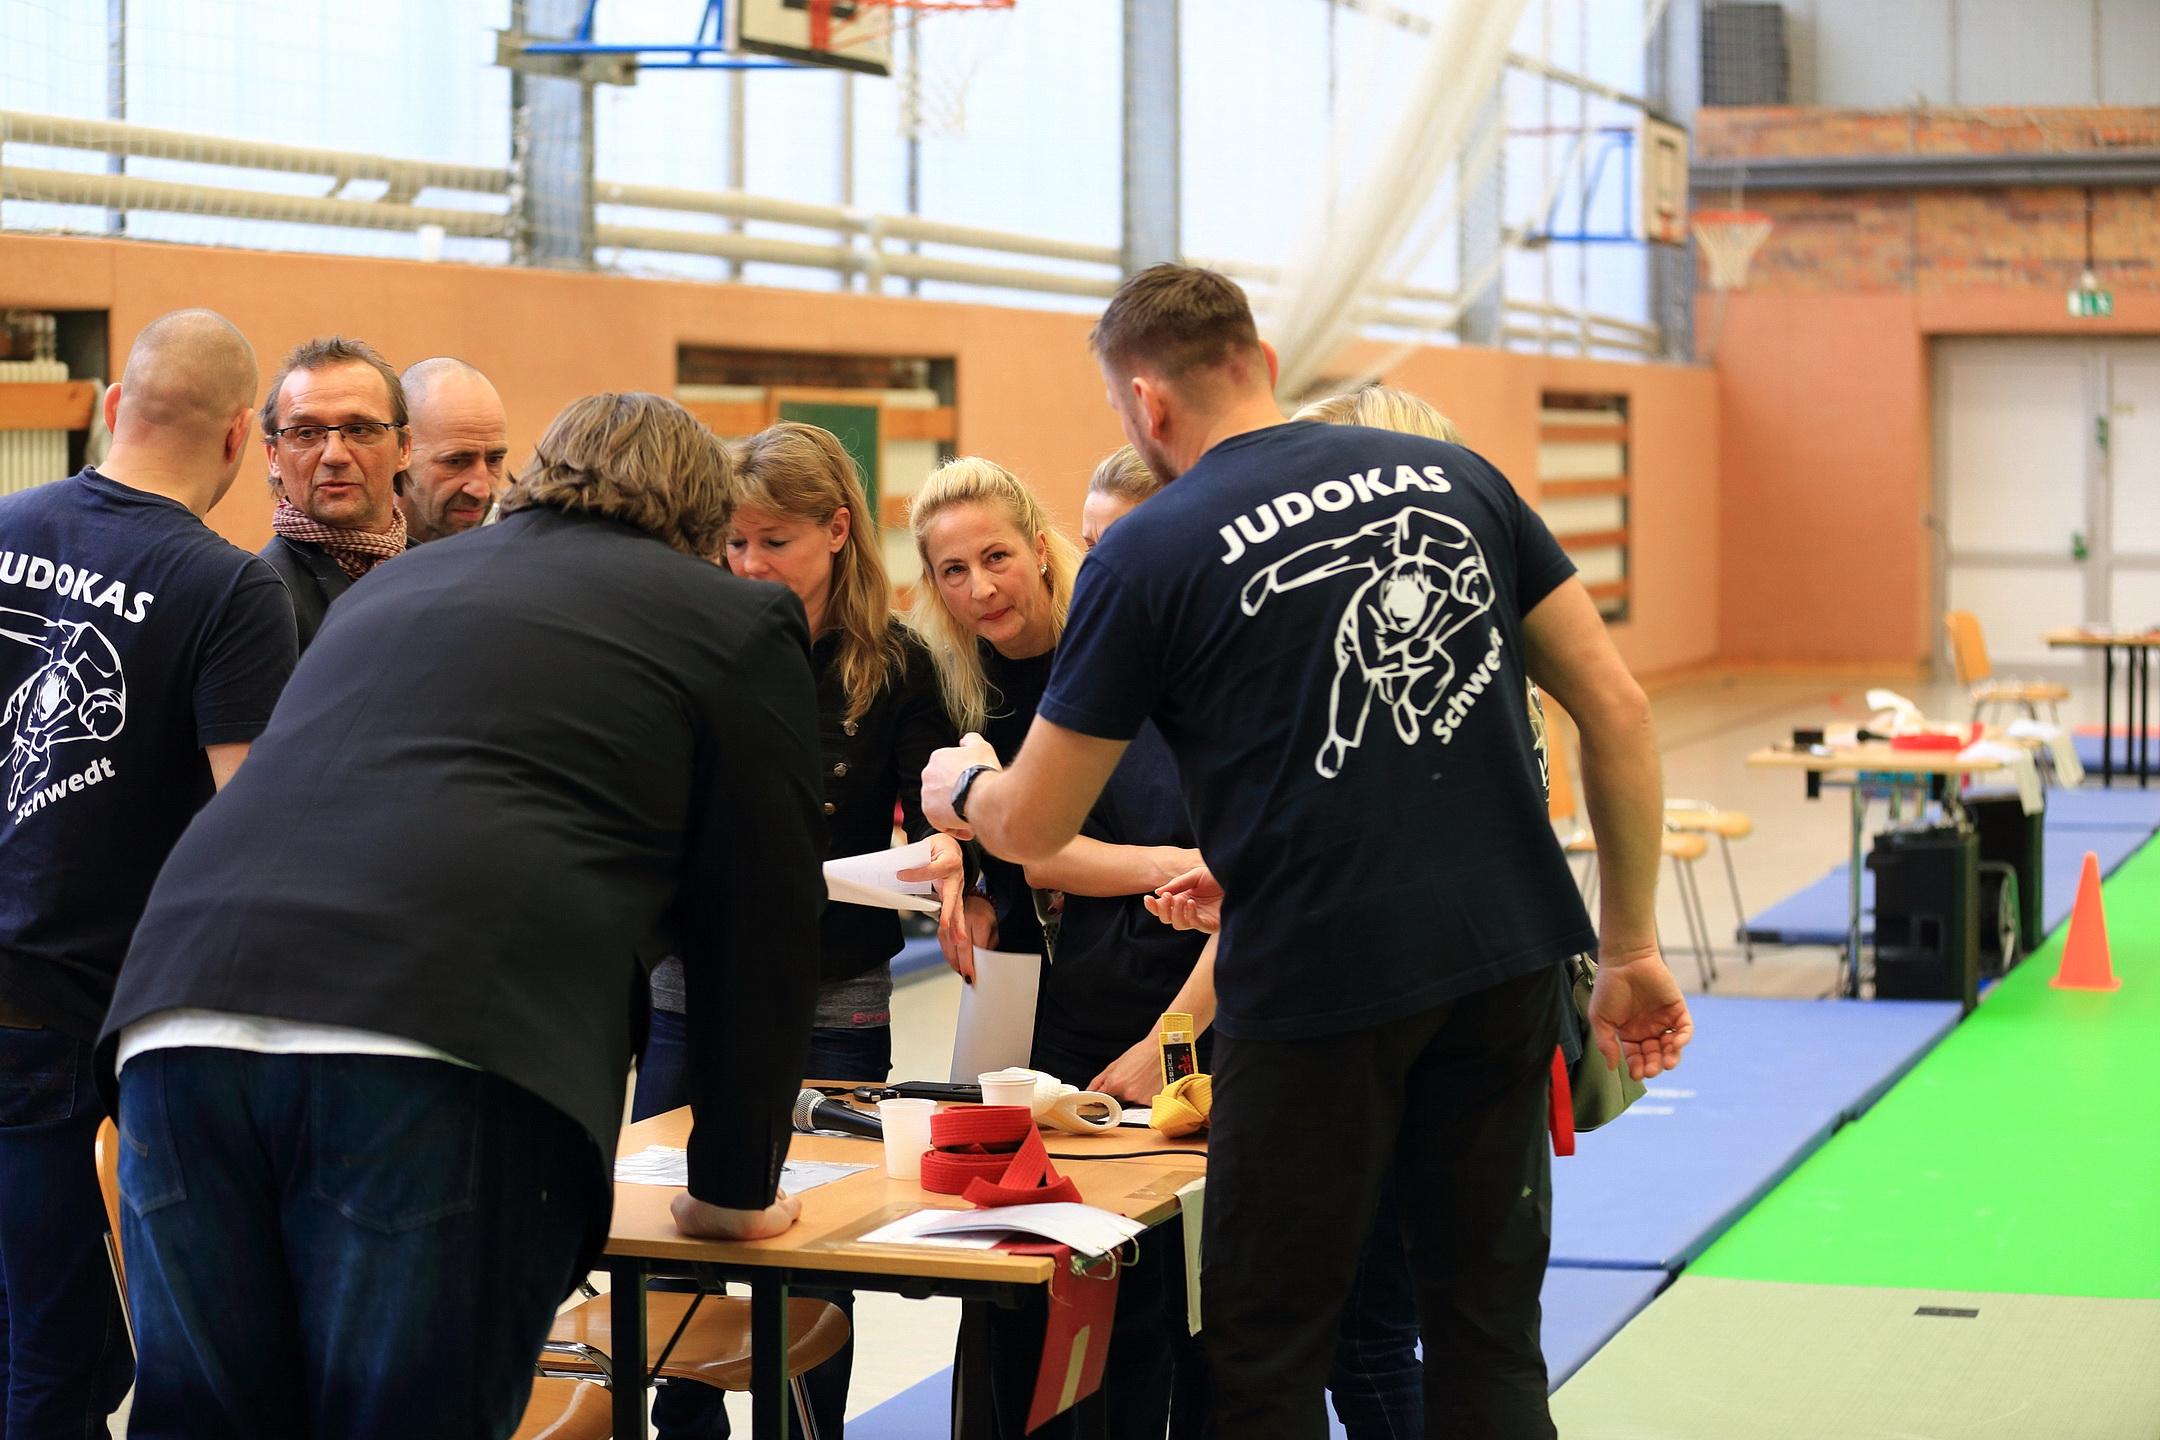 2016-Nikolausturnier Judokas Schwedt (29)